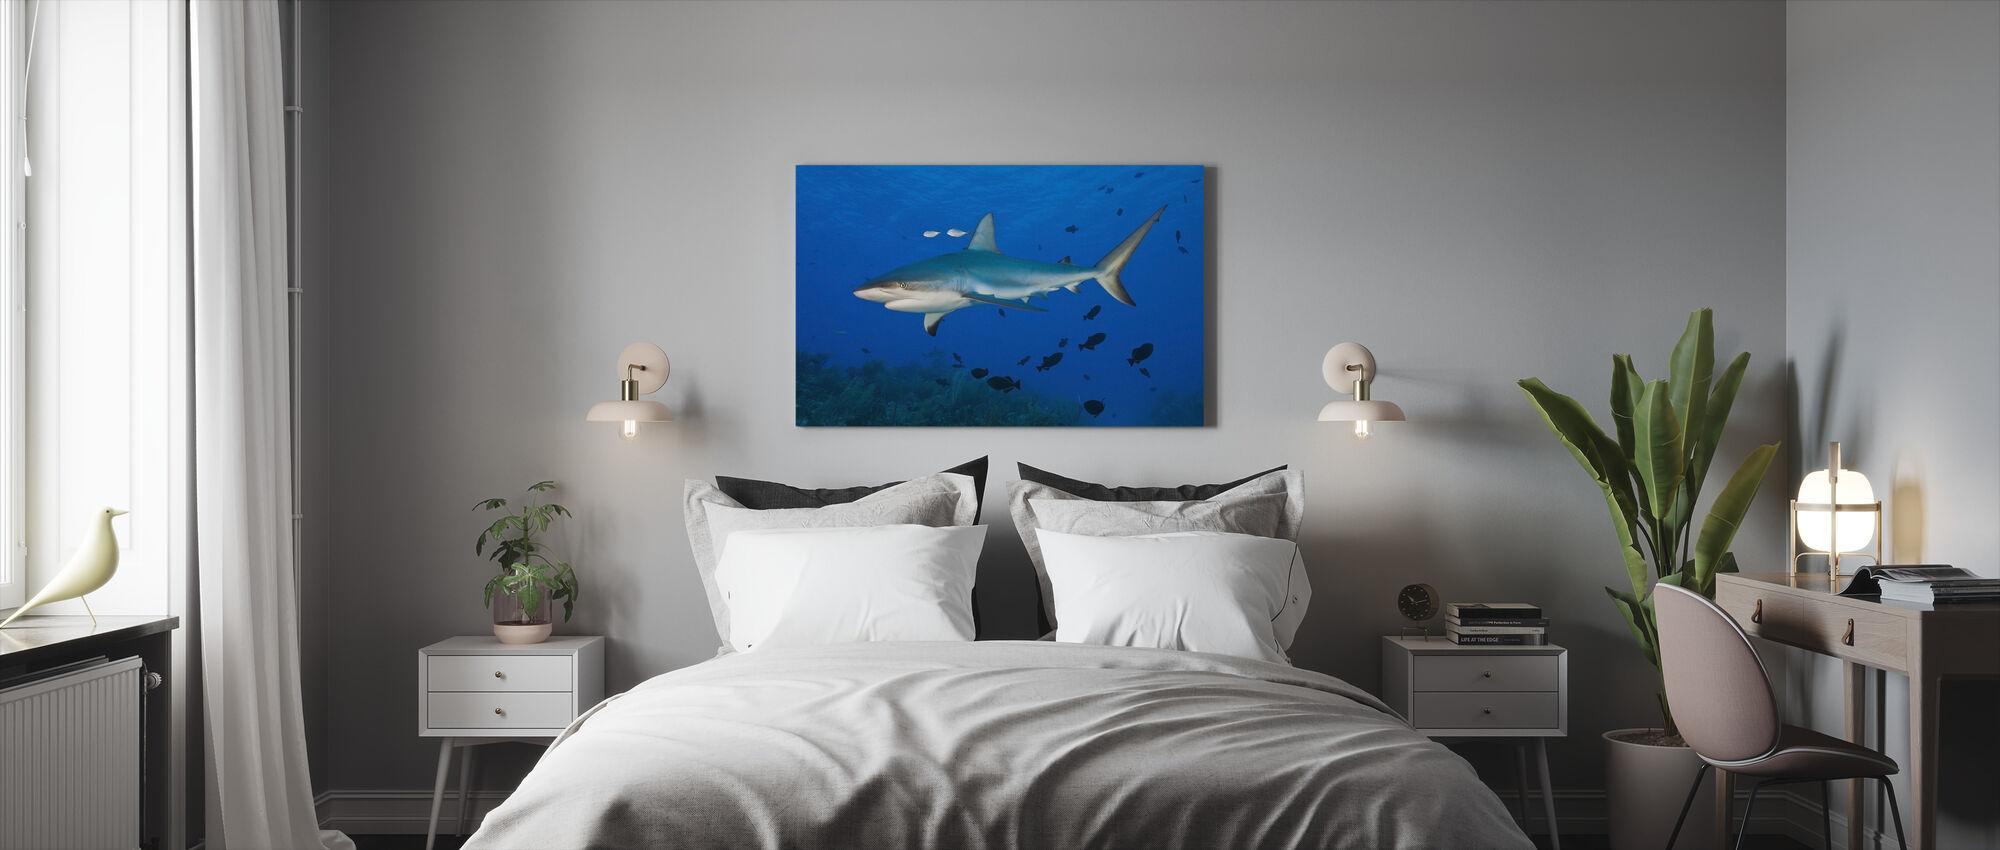 Karibian riuttahai - Canvastaulu - Makuuhuone